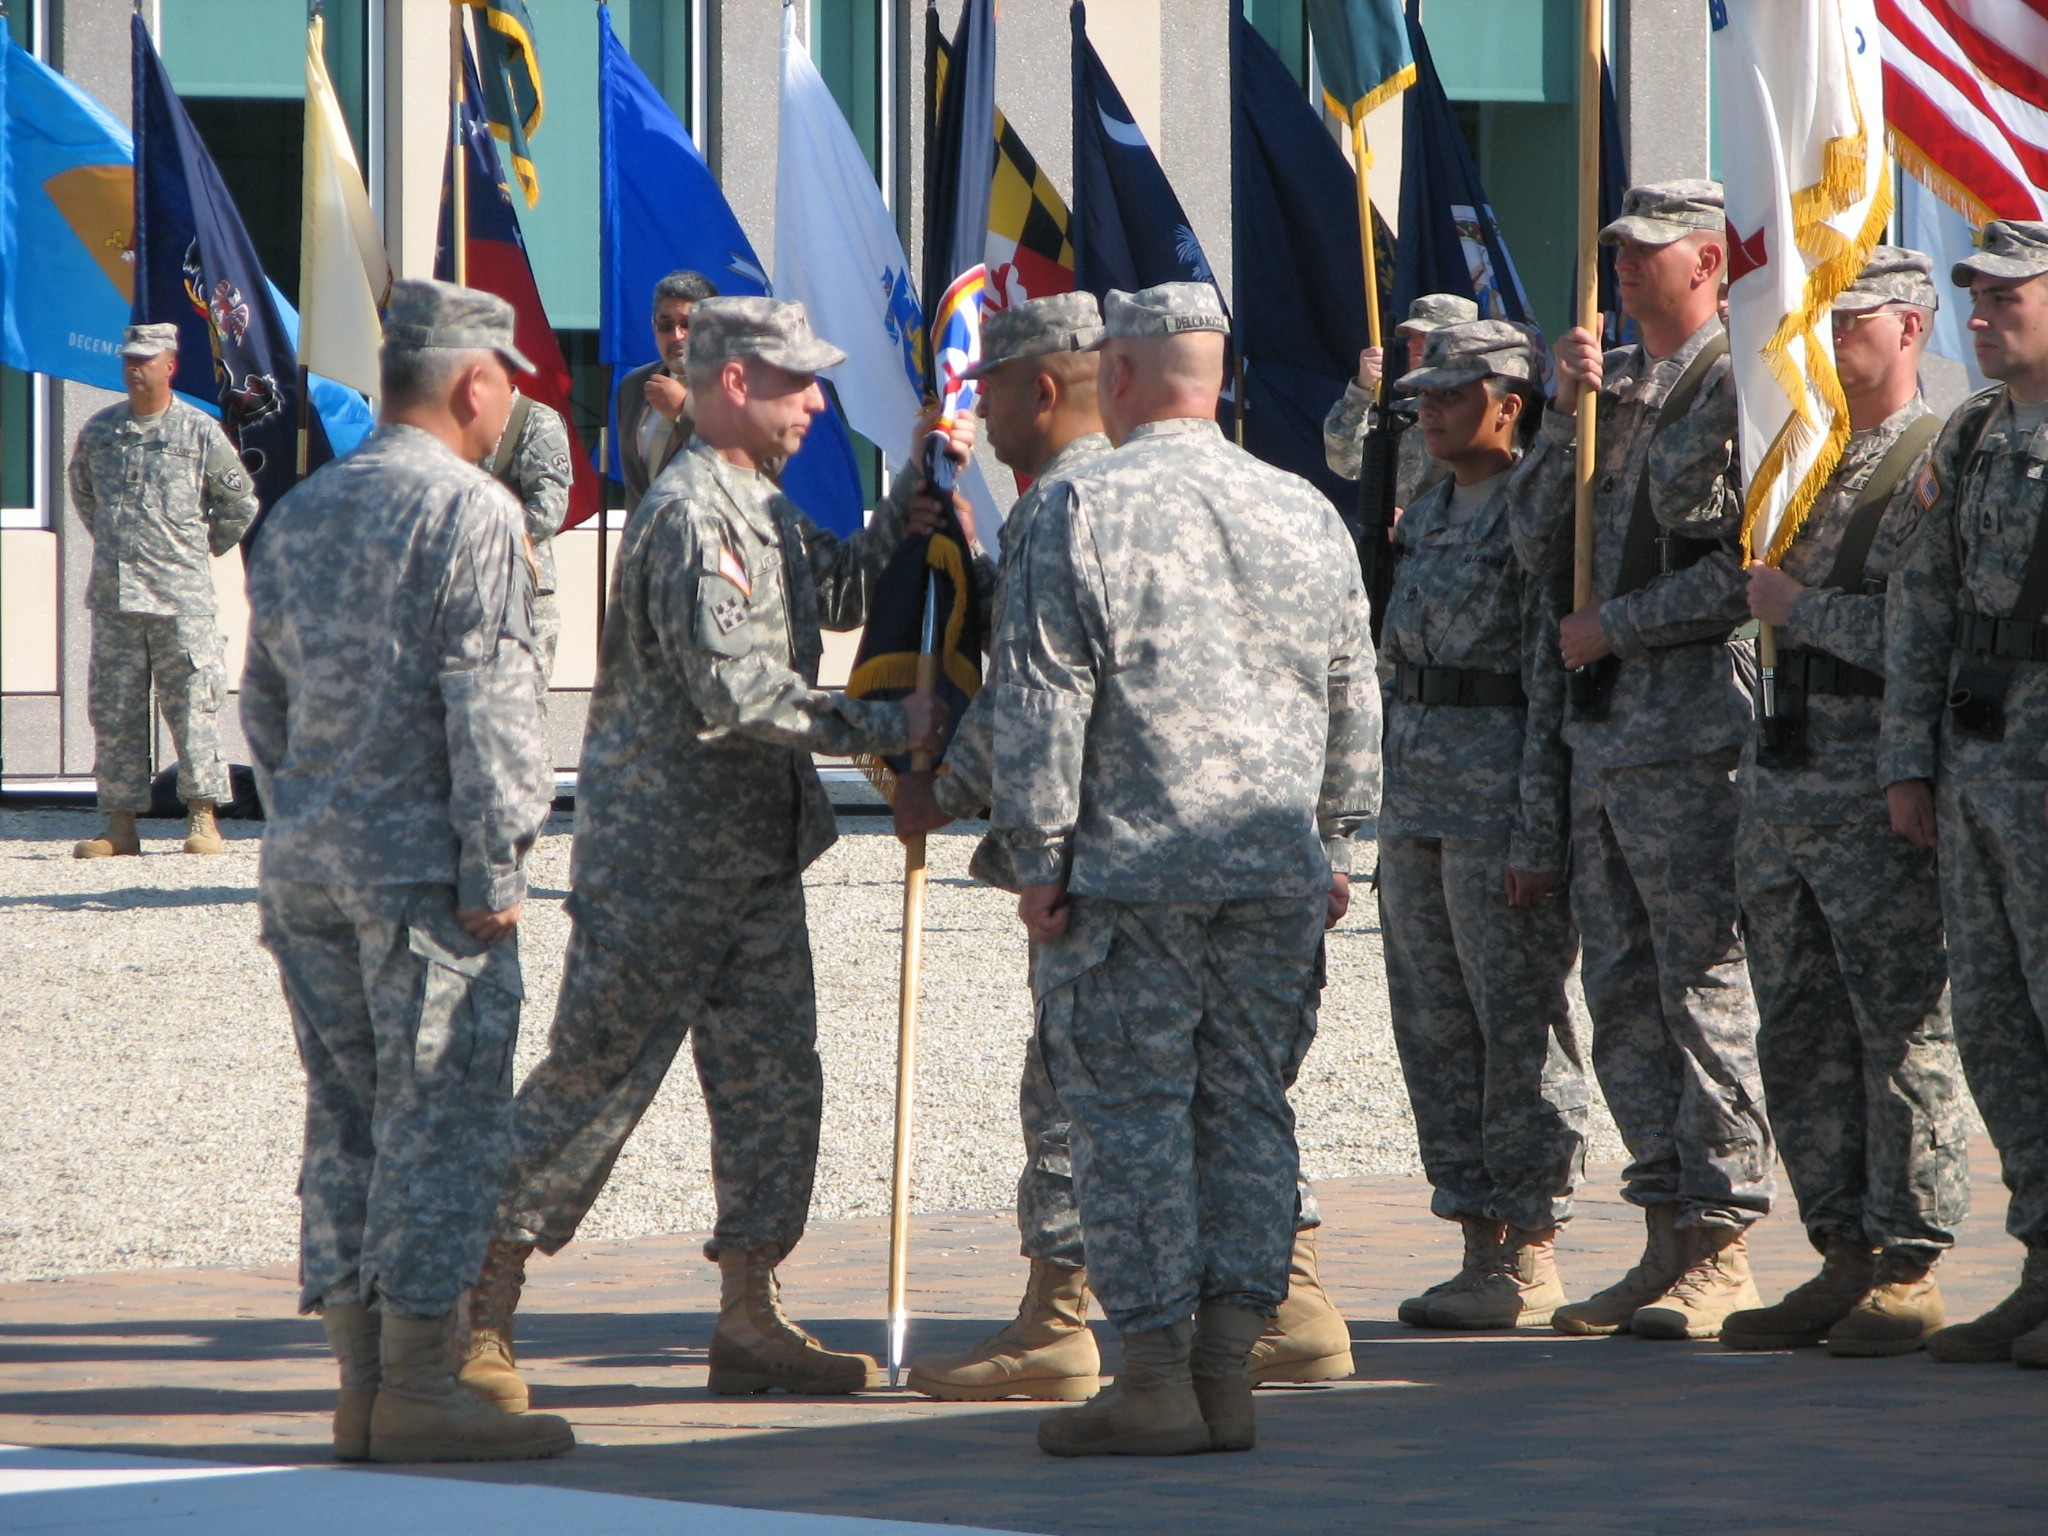 atec welcomes new commanding general dellarocco to retire original first sgt paul